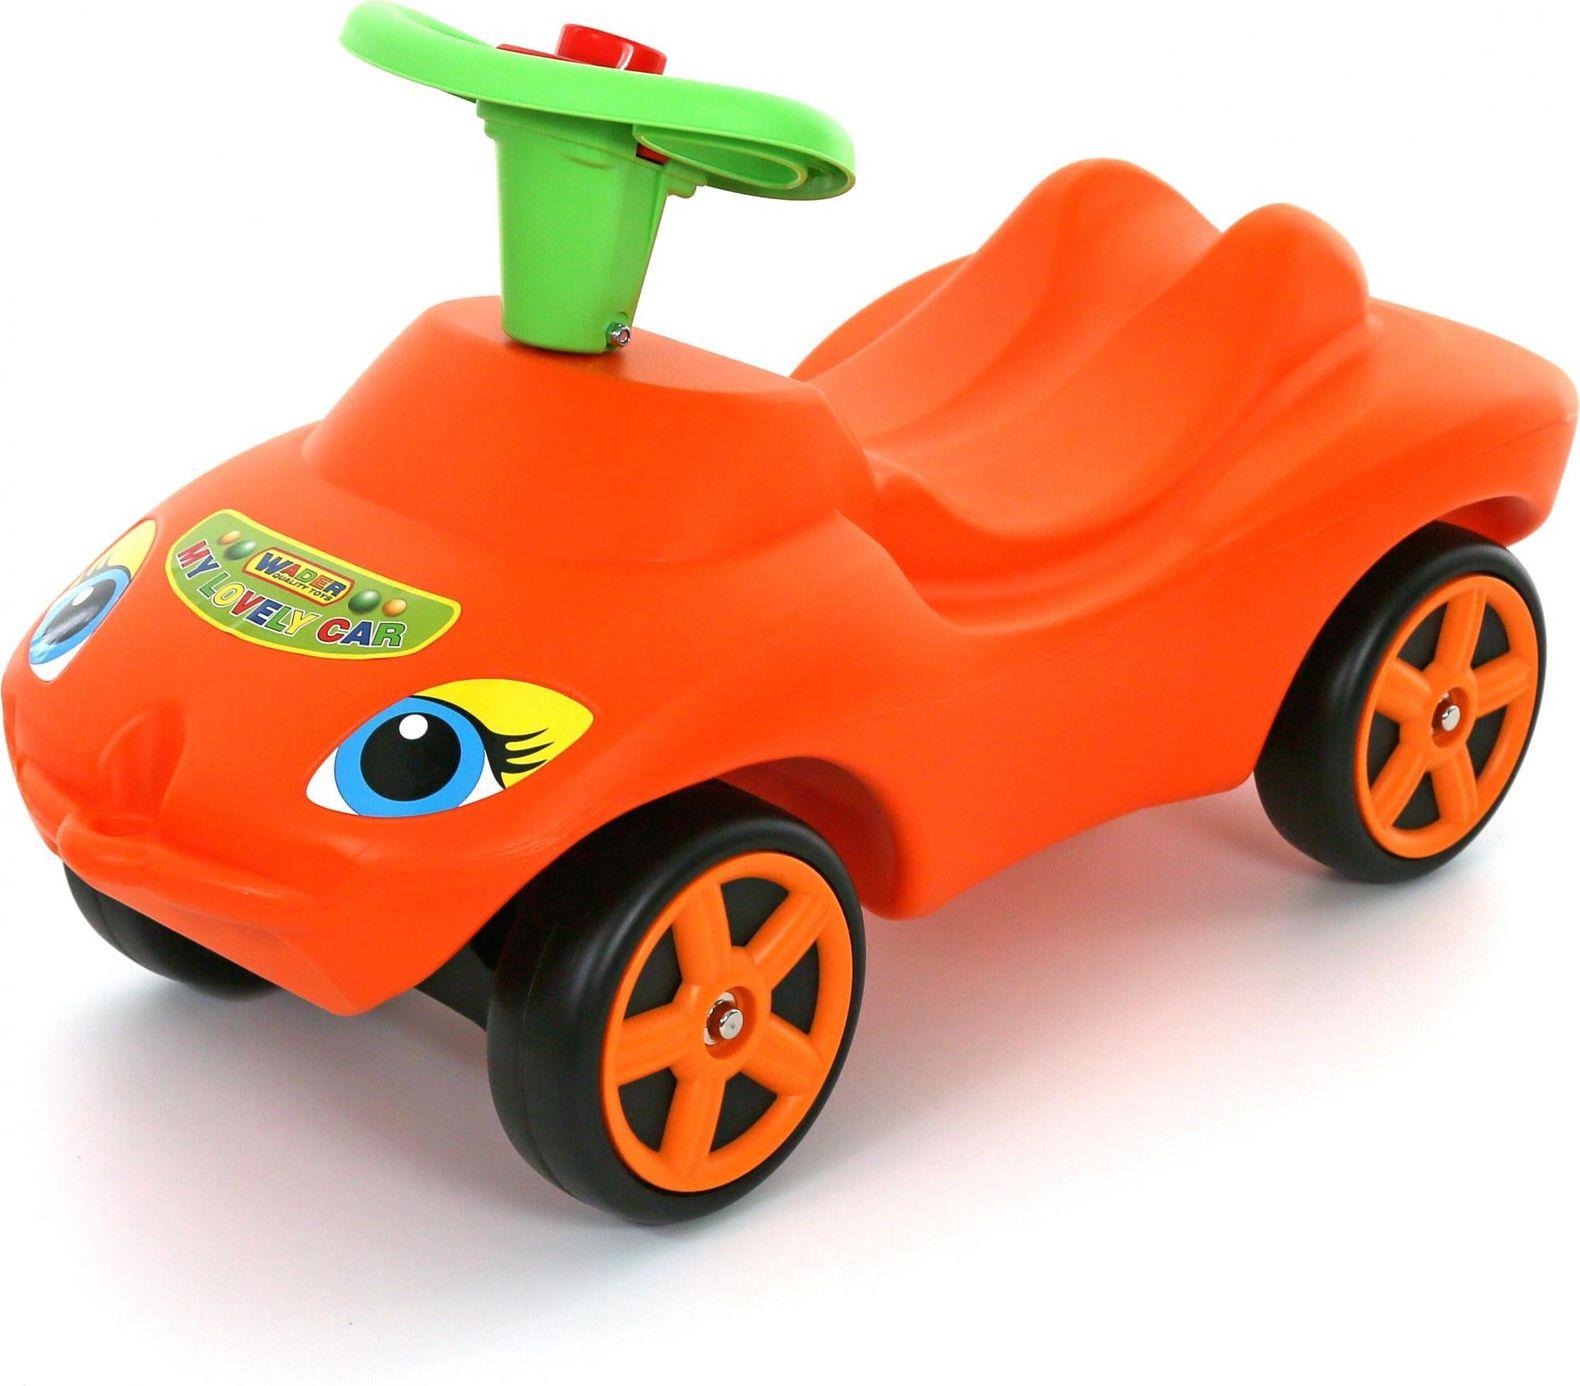 Wheelchair My favorite car orange with sound signal my favorite bear